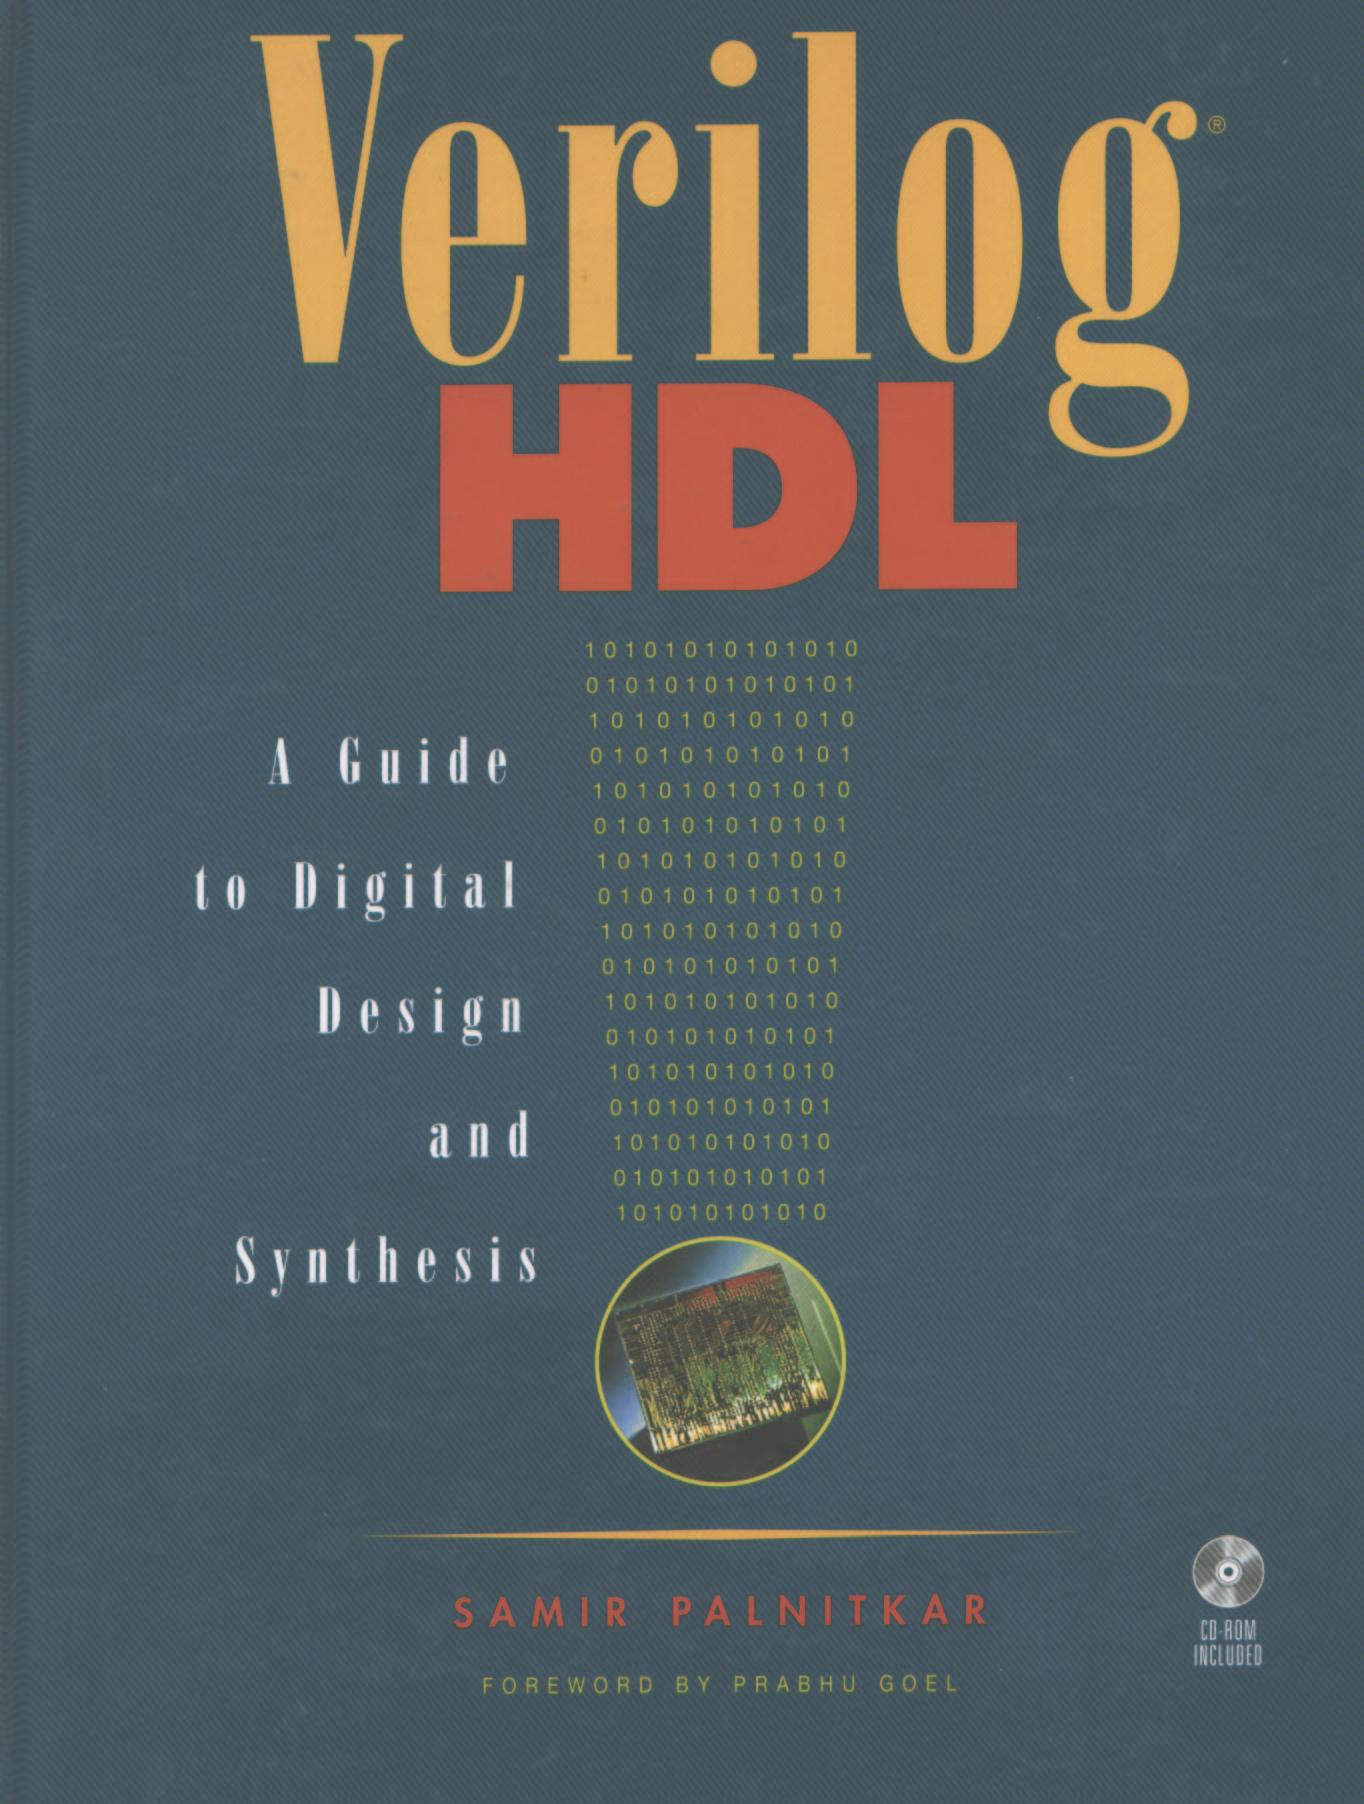 ebook pldworld com - /_eBook/FPGA/HDL/-Eng-/Verilog HDL - A Guide